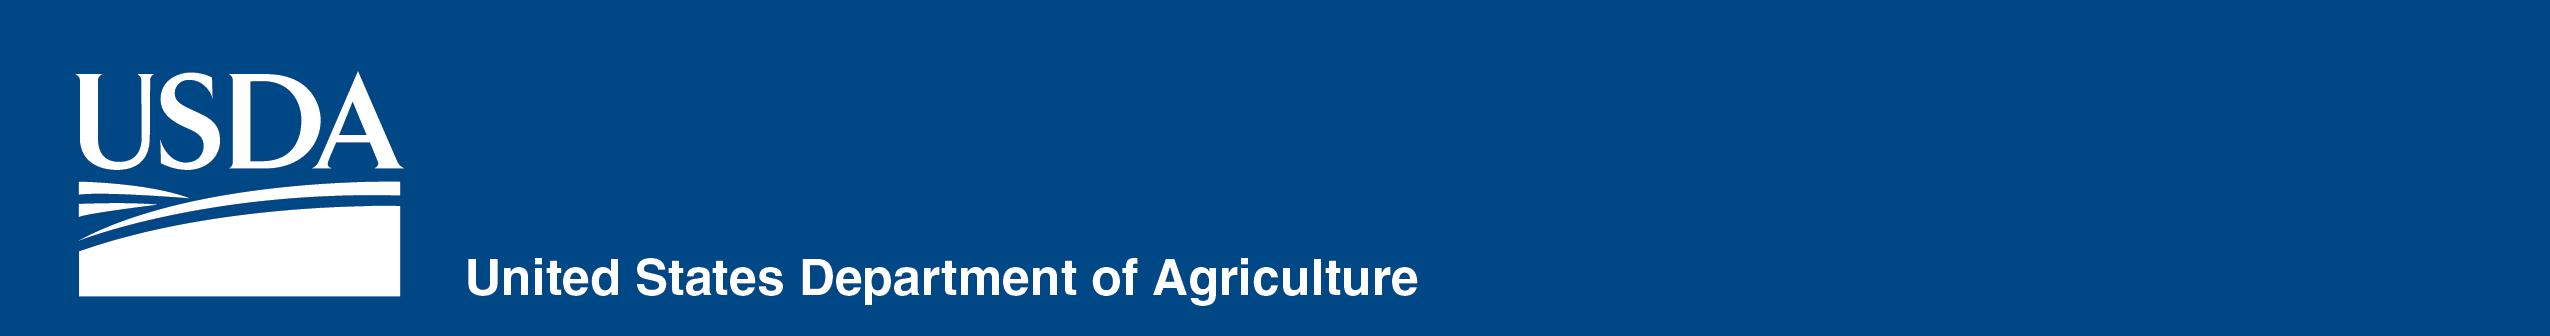 USDA Banner